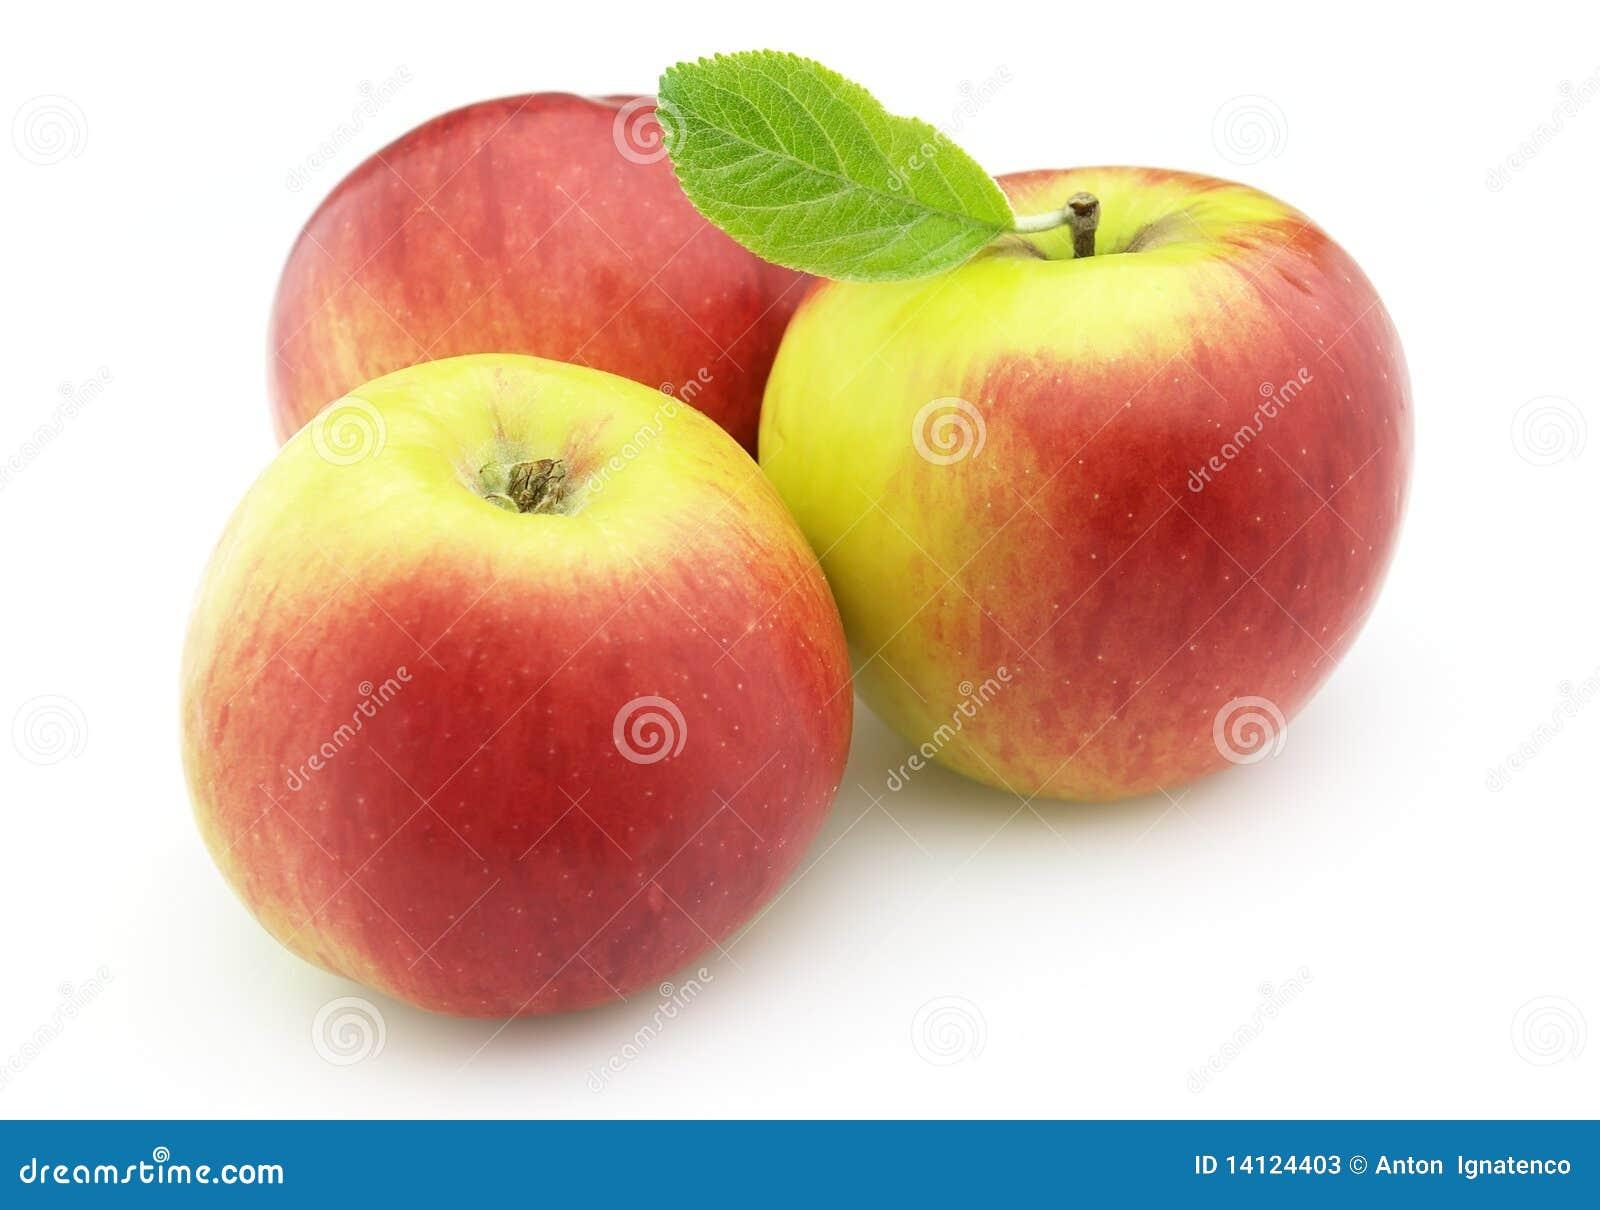 Sweet apples stock image. Image of object, bright, medium ...